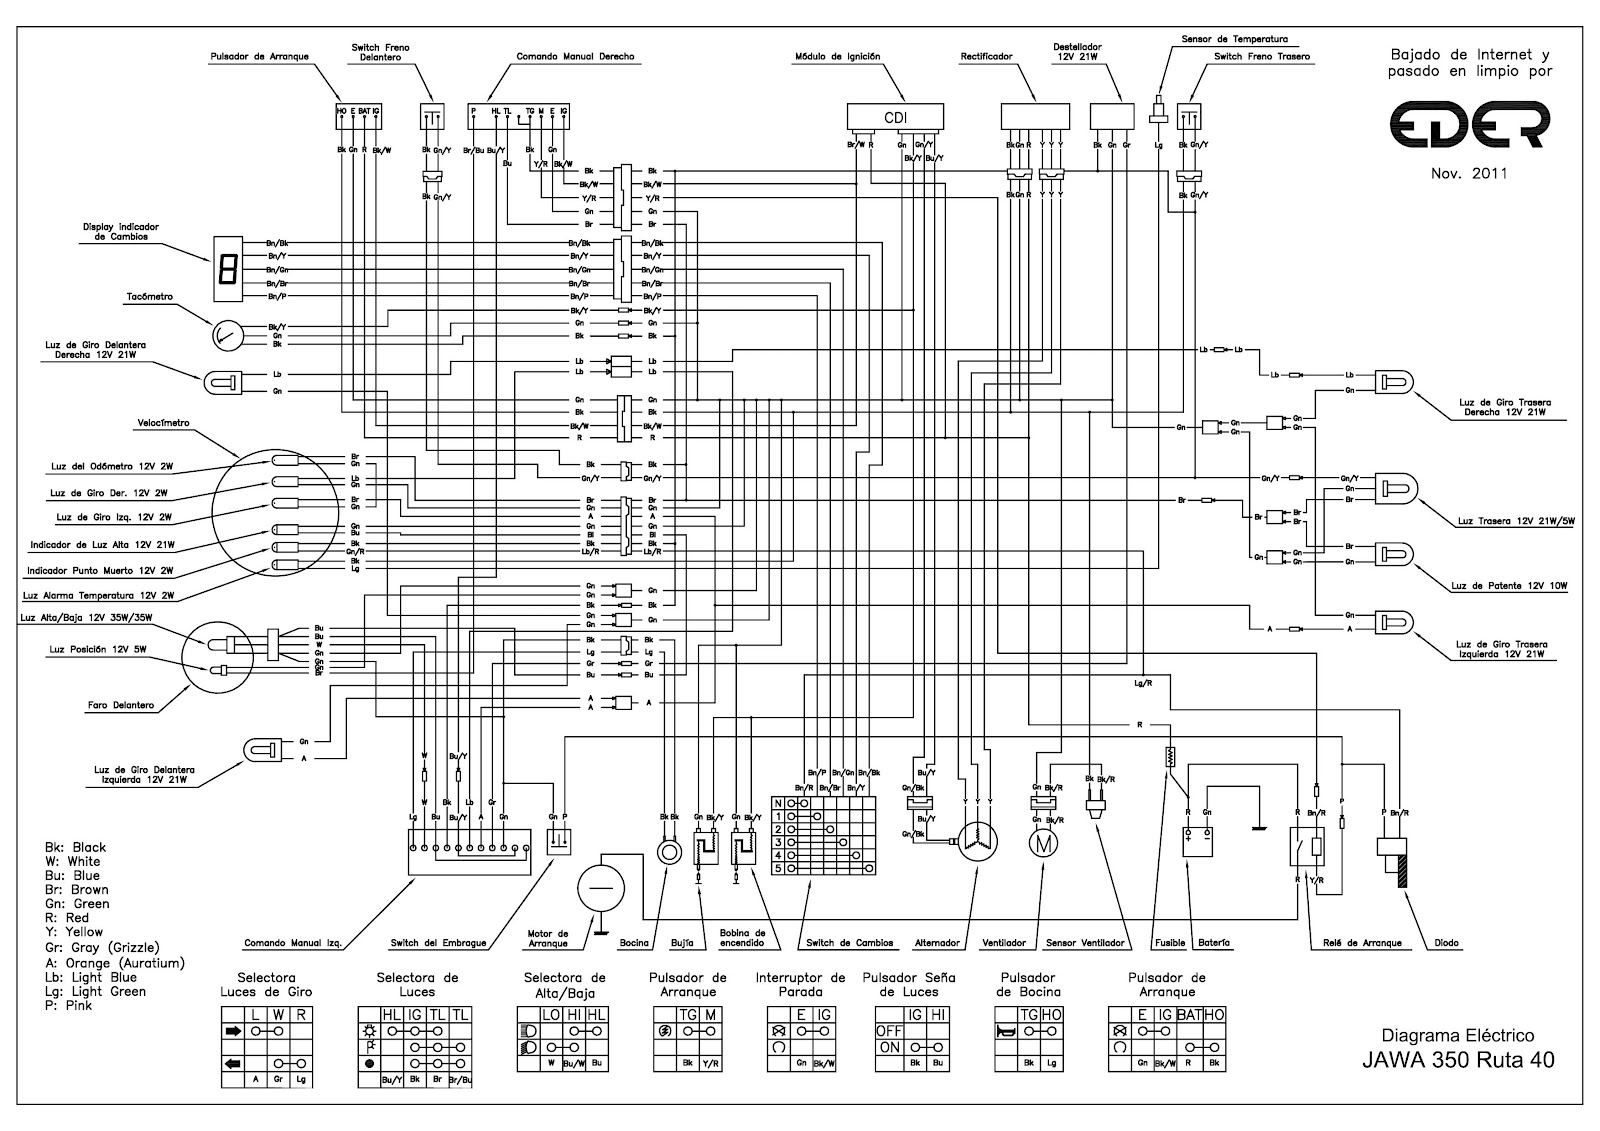 Mi Jawa 350 Ruta 40: Diagrama Eléctrico Jawa 350 RUTA 40